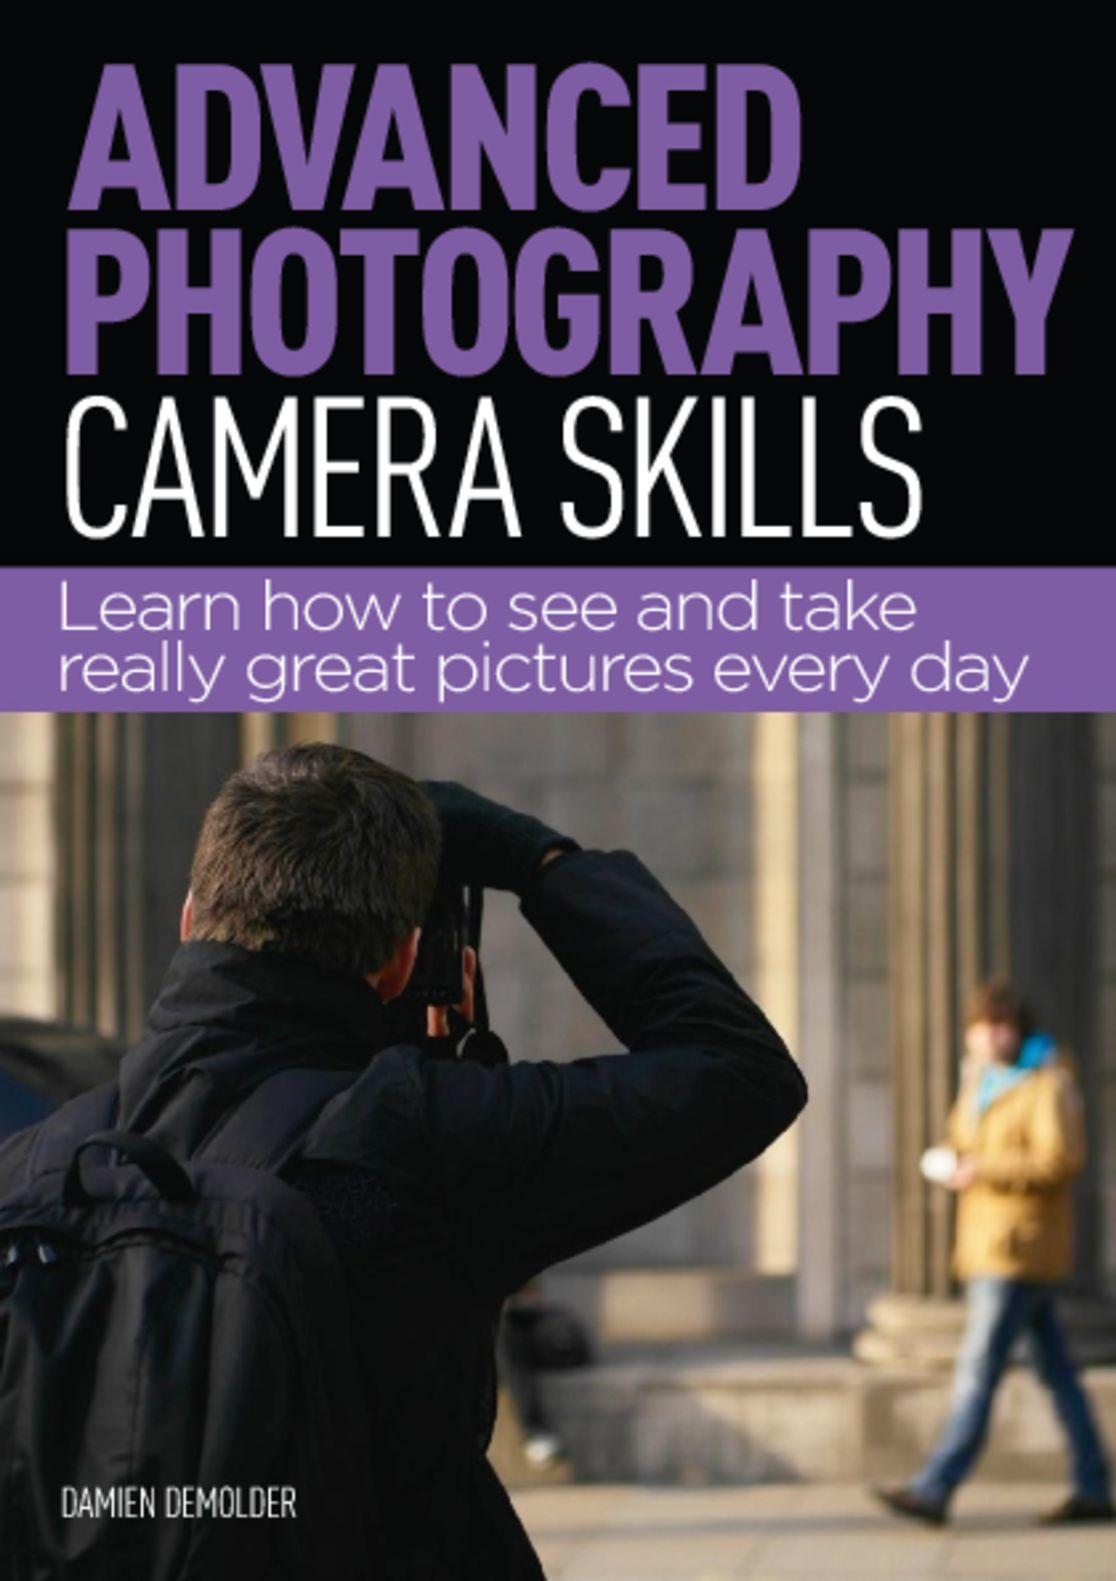 Advanced Photography Camera Skills Digital